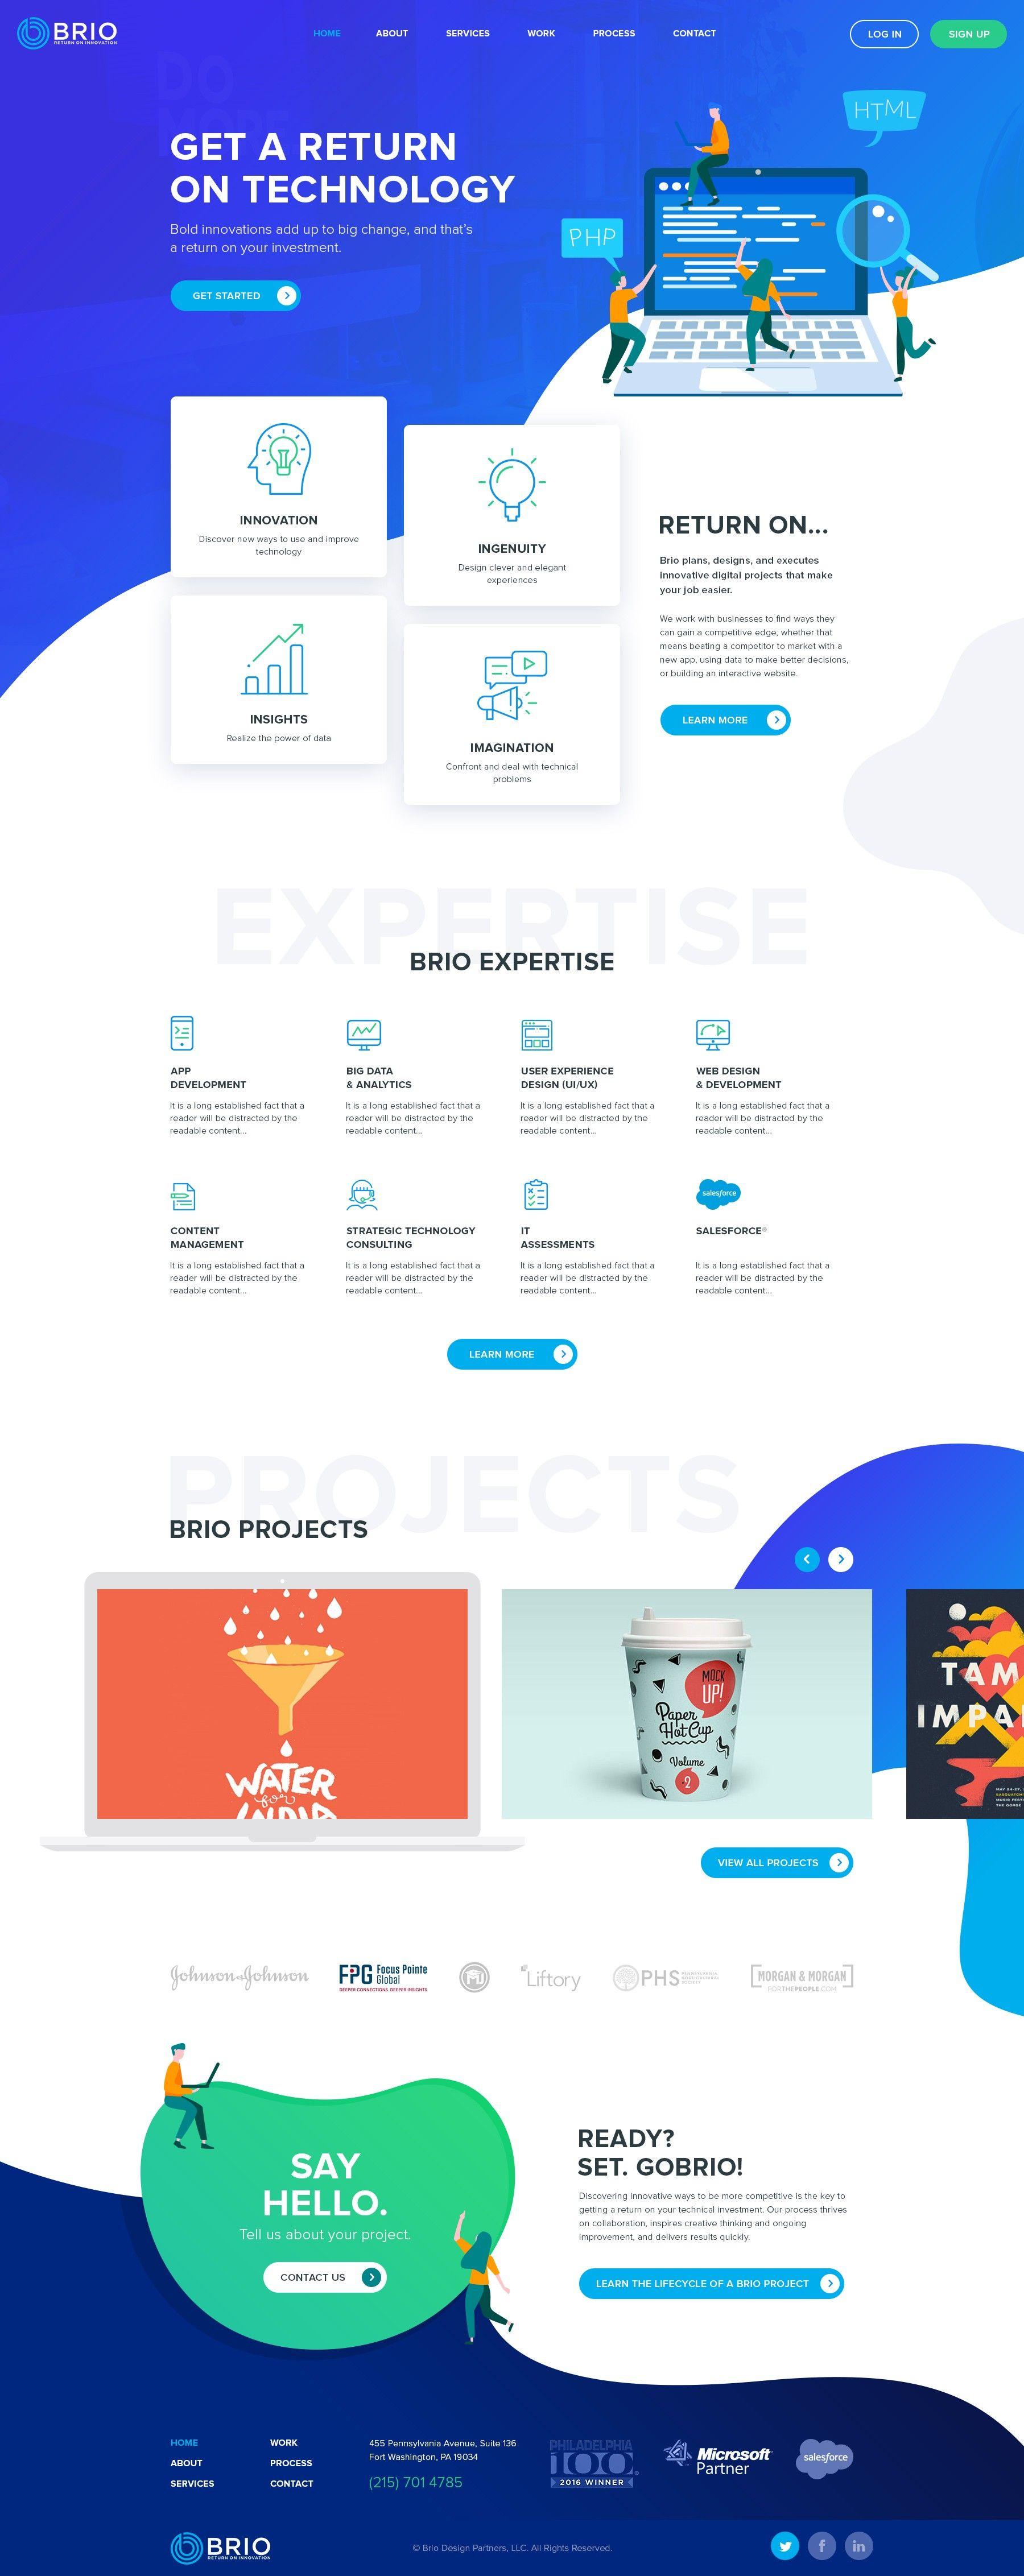 Brio 99designs Corporate Website Design Web Design Web Development Design